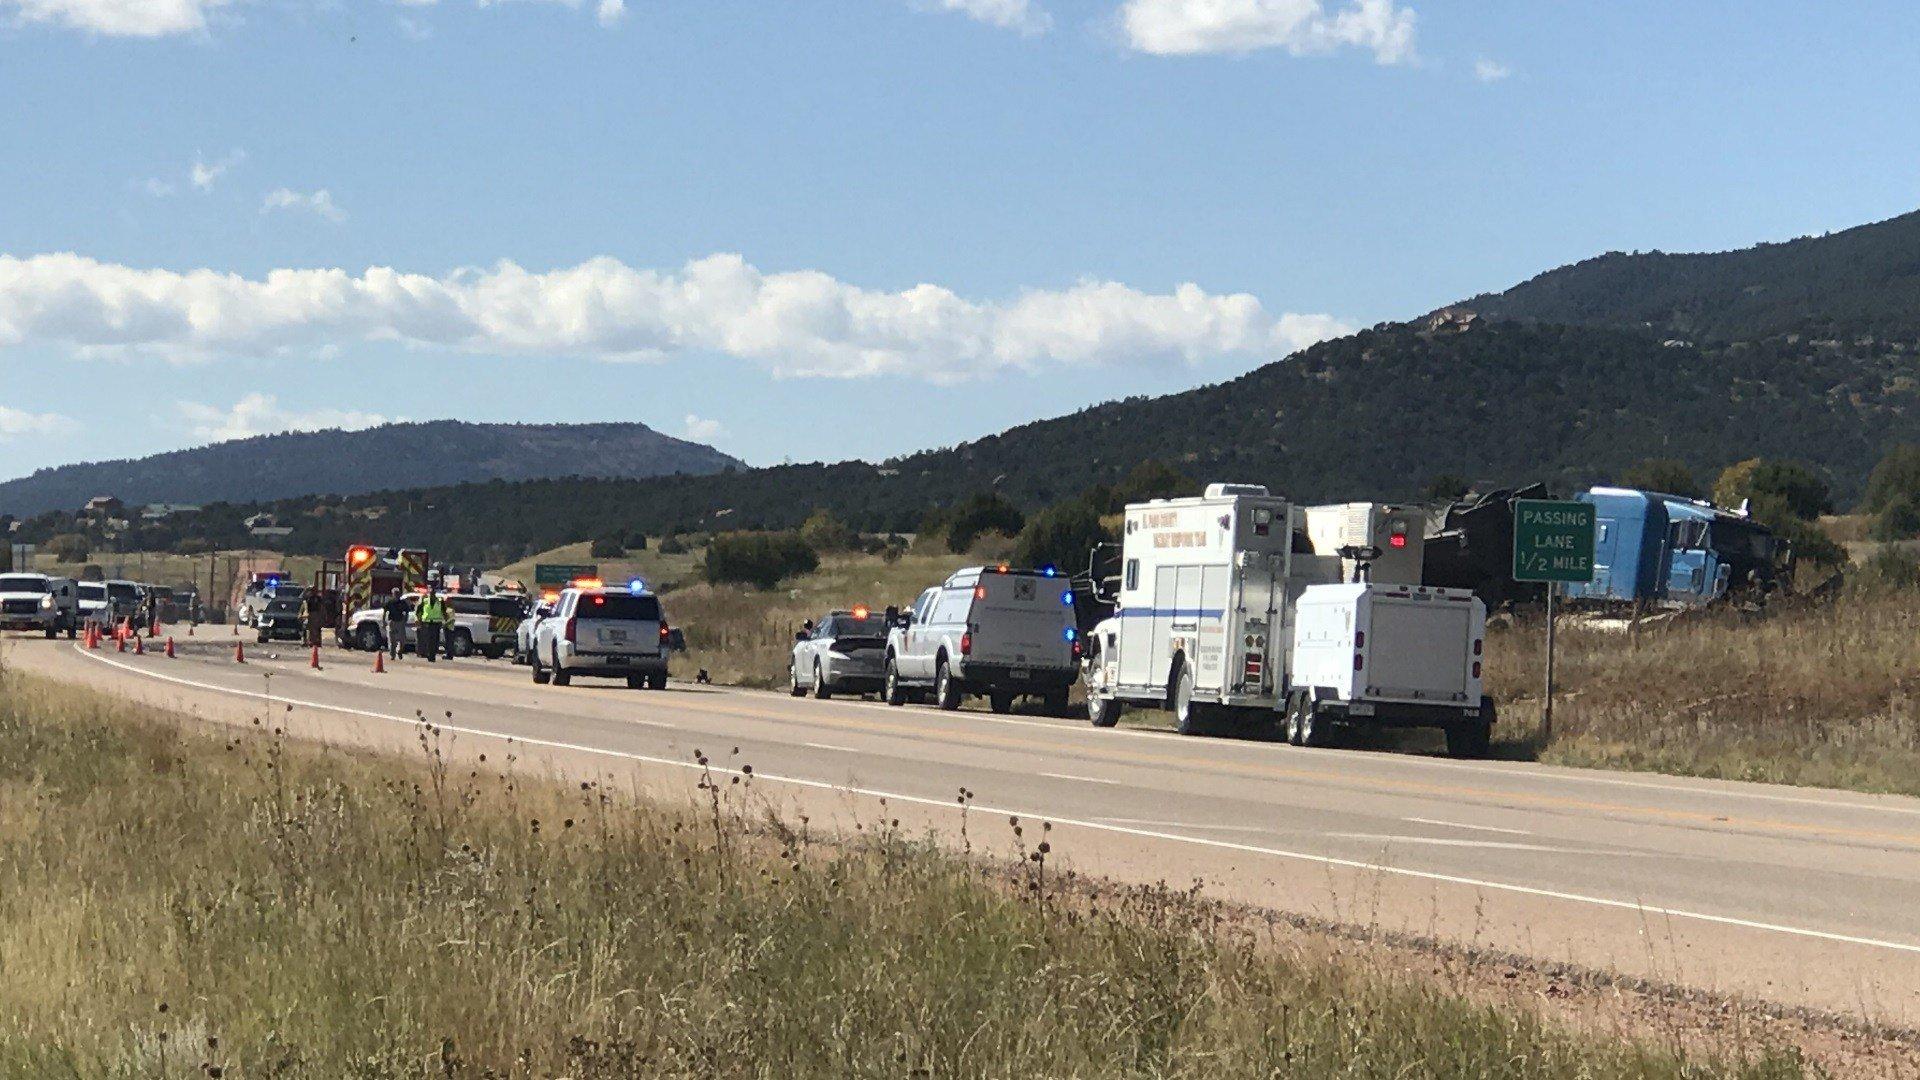 Colorado State Patrol investigates fatal crash on Highway 115. (KOAA)